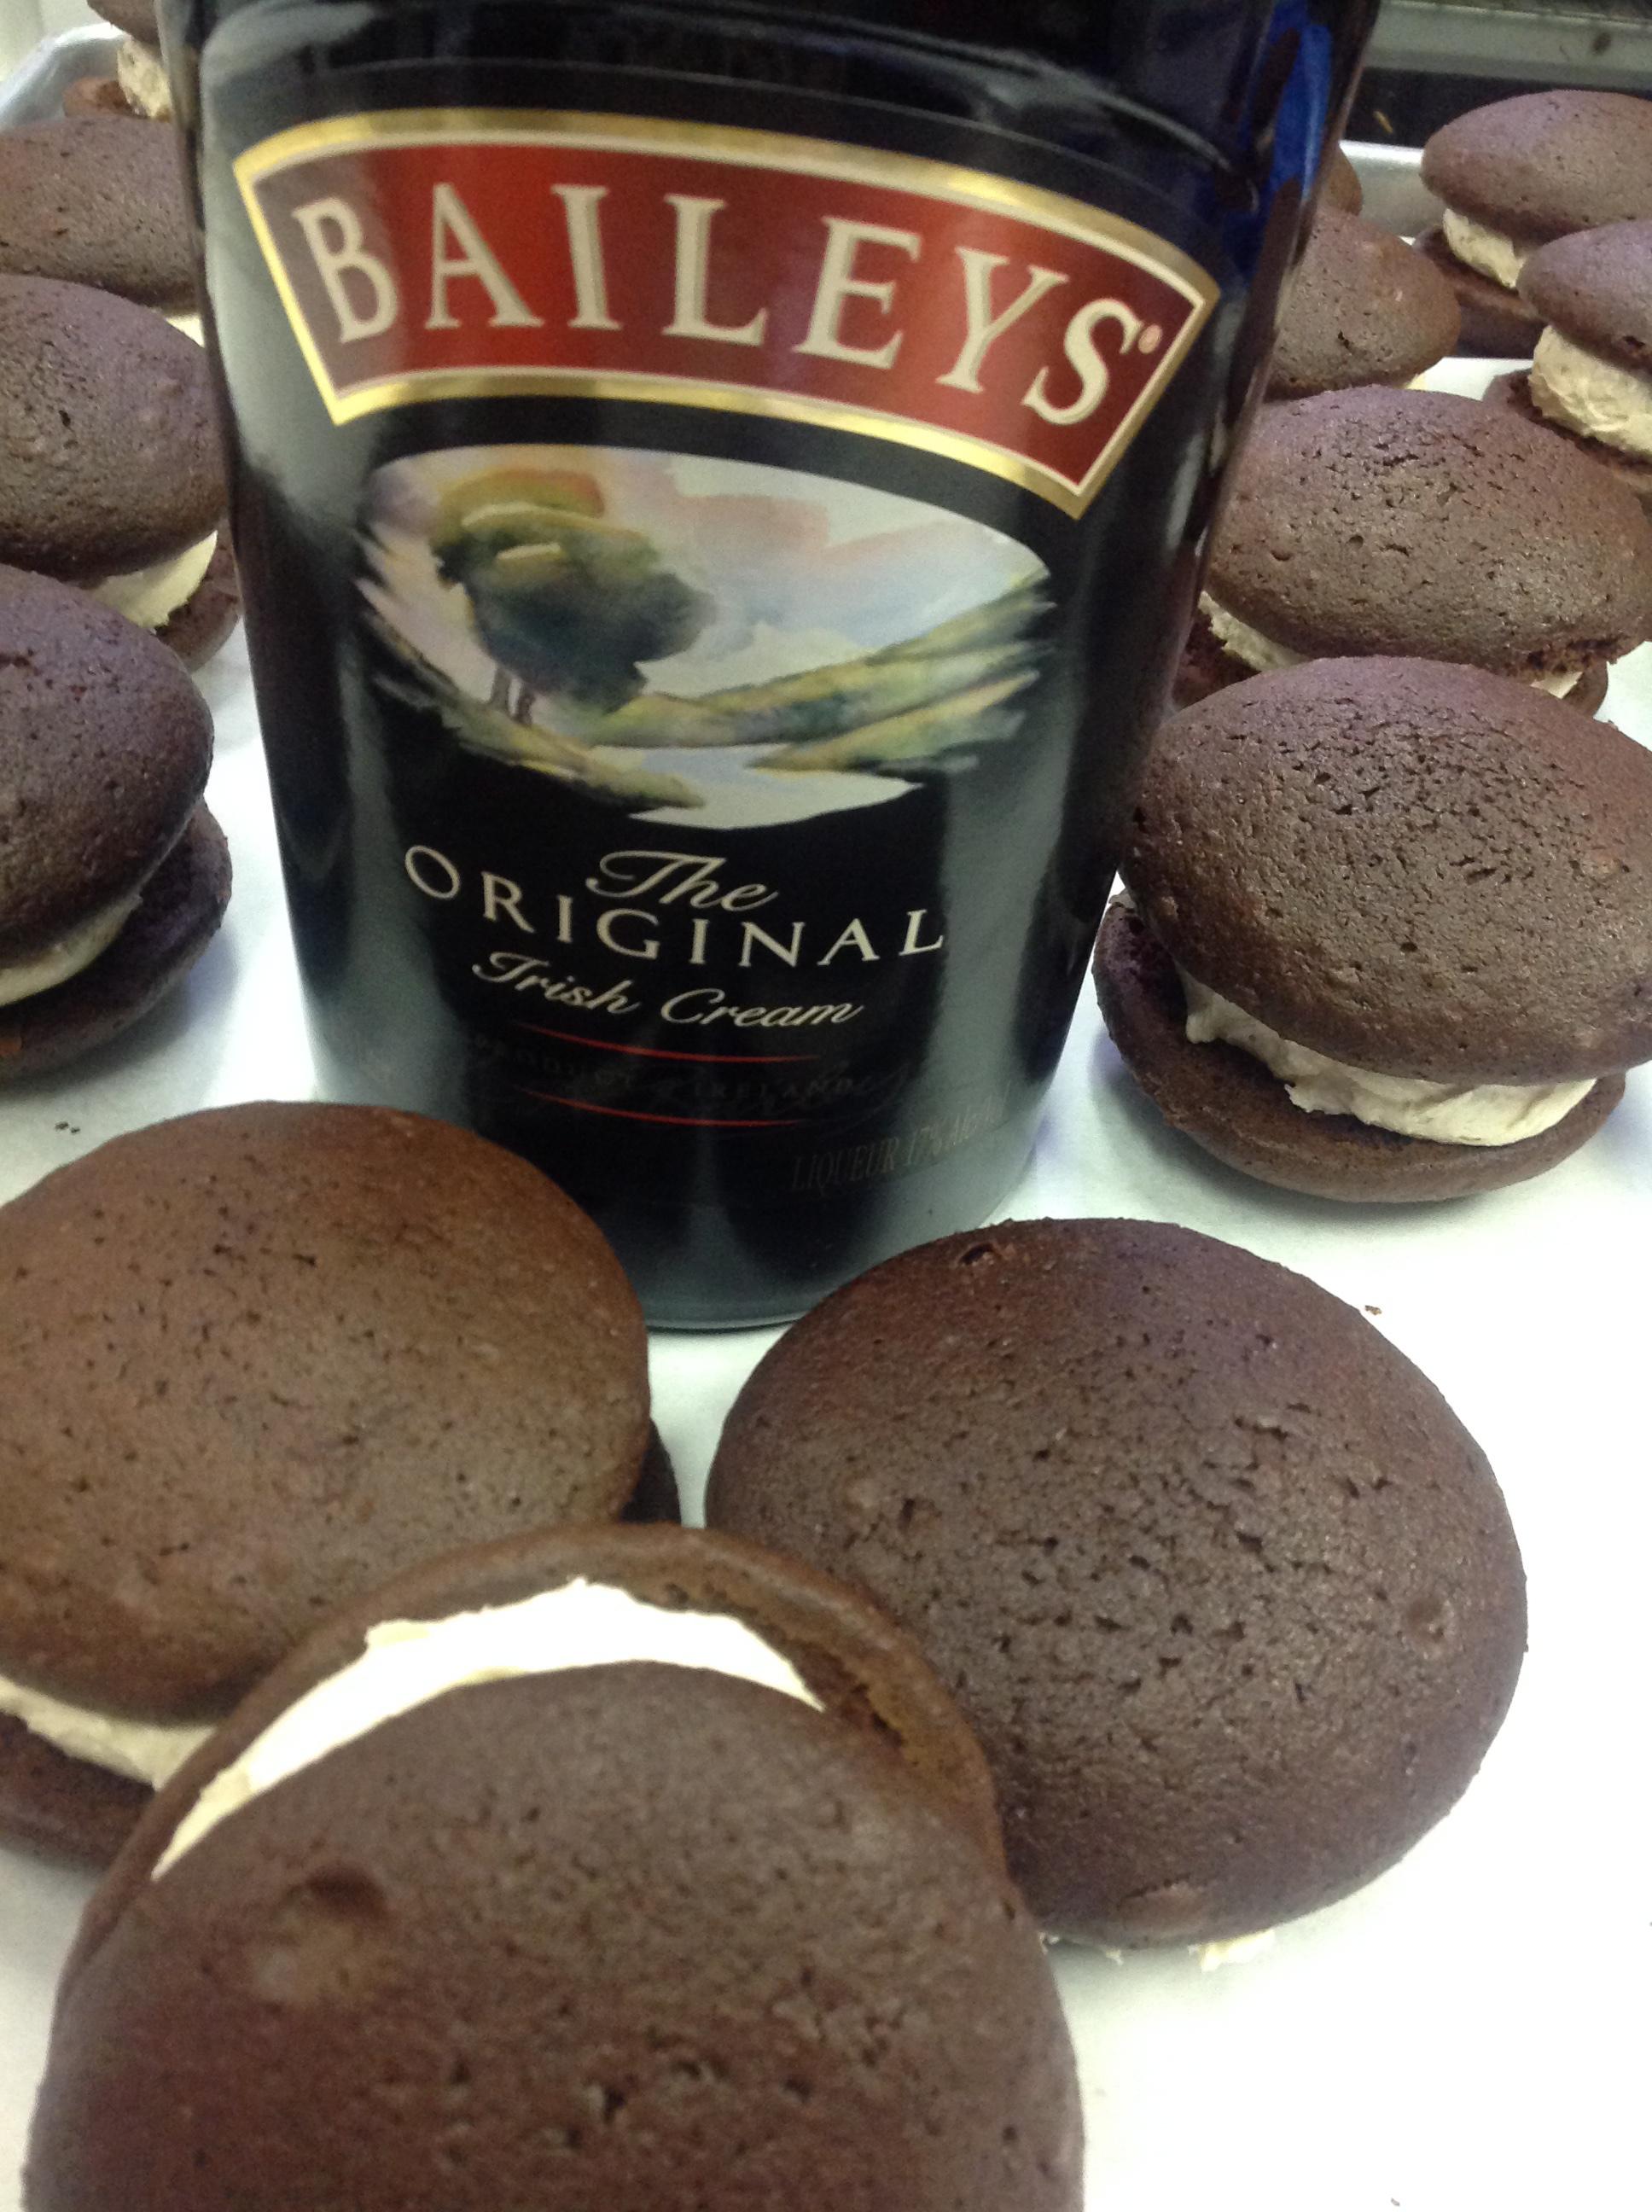 Baileys   Chocolate cookie with Bailey's Irish Cream filling